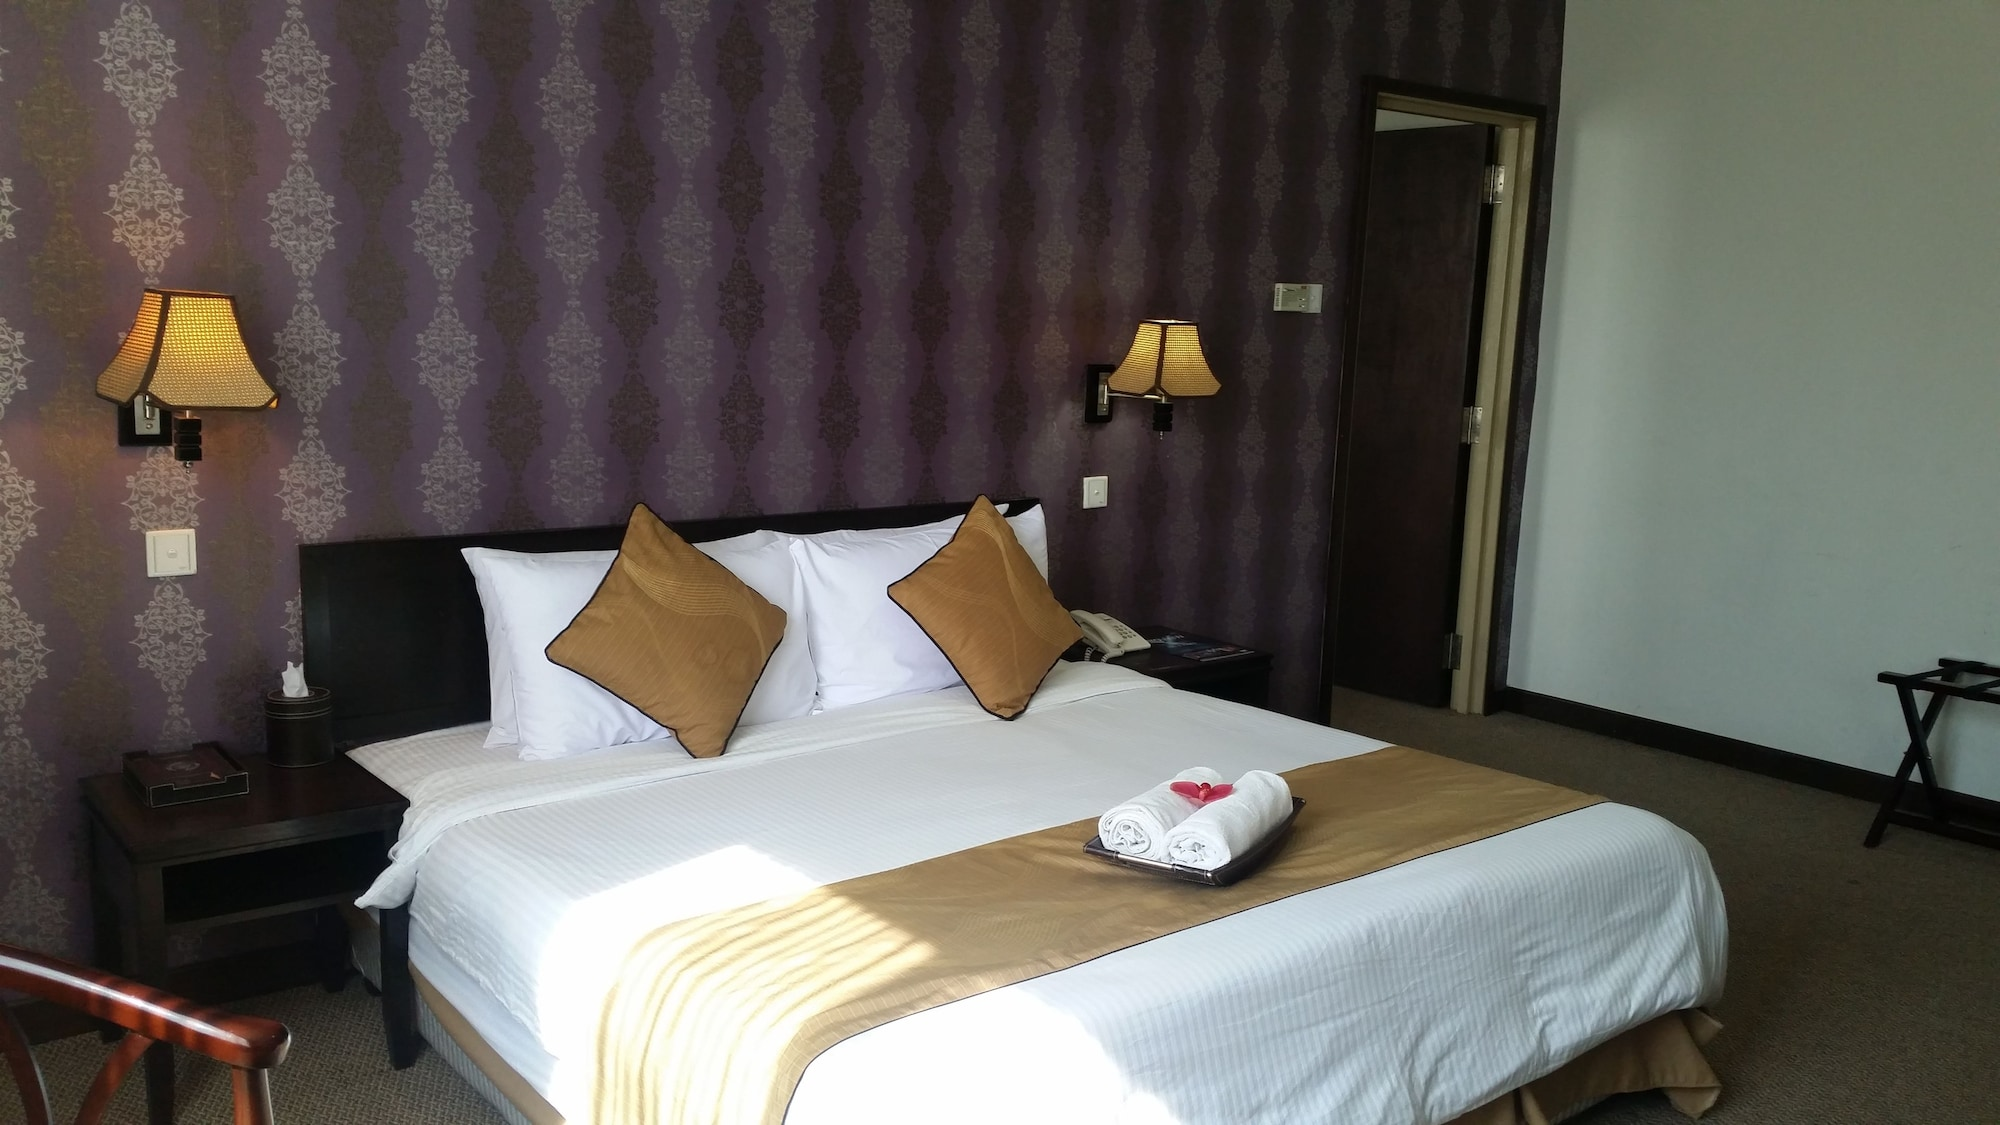 Carlton Holiday Hotel & Suites, Kuala Lumpur